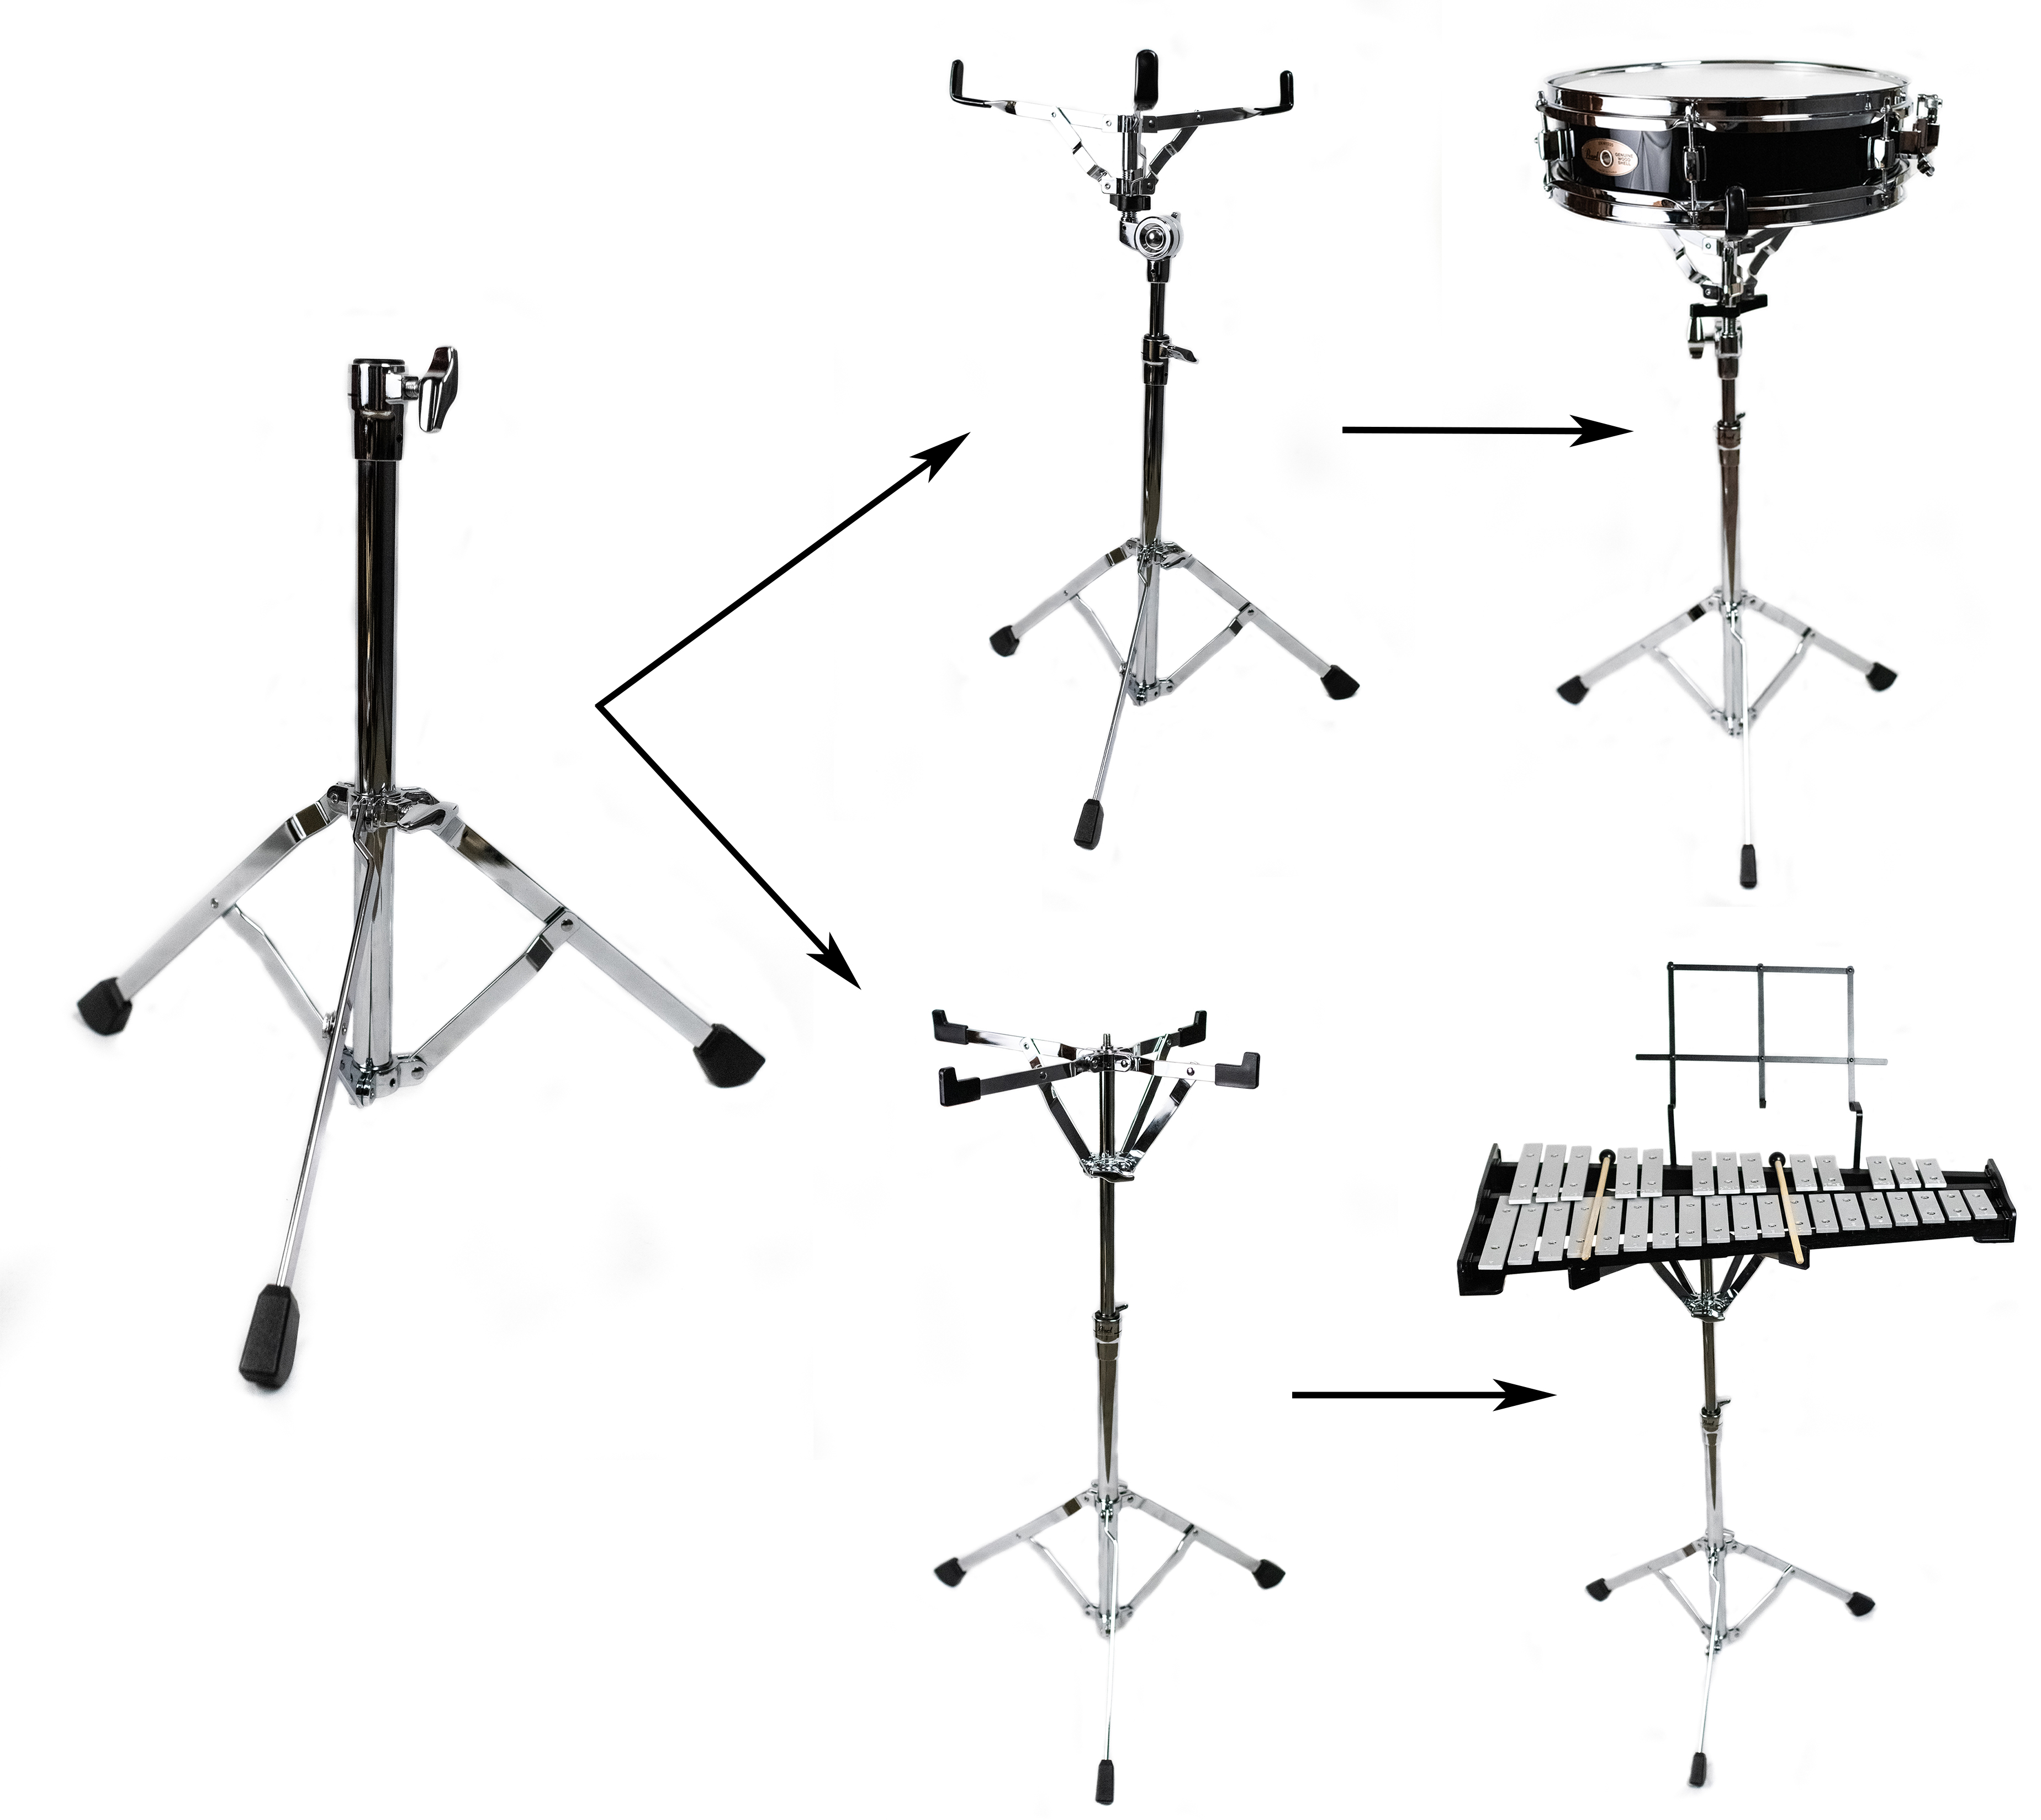 Assembling Percussion Kits